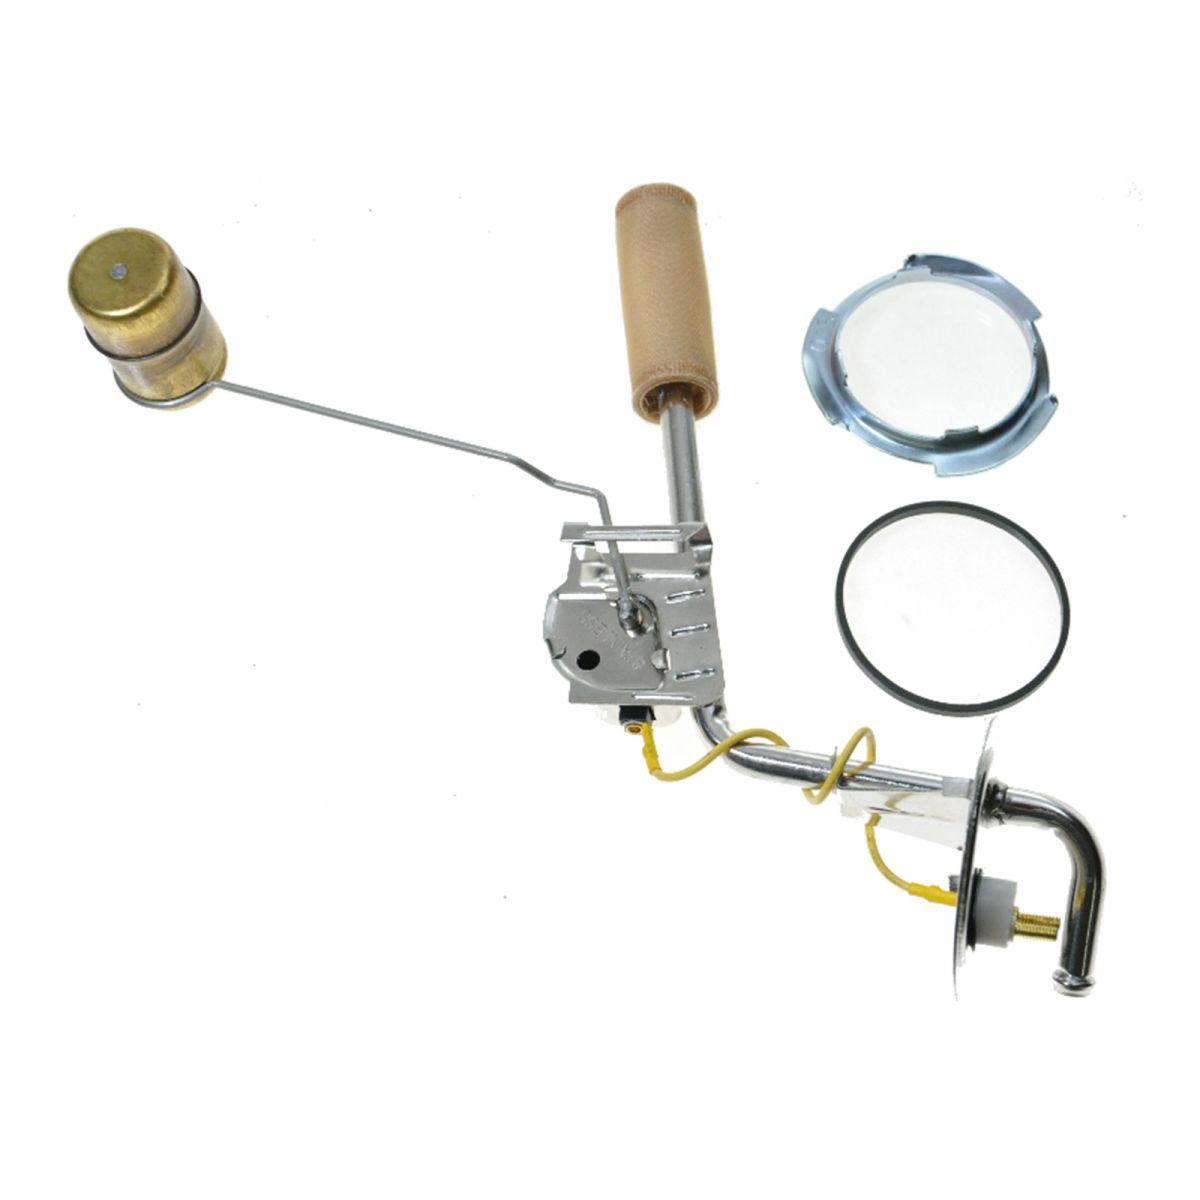 mercury energy level diagram australian ceiling light wiring stainless steel gas tank fuel sending unit for 71 73 ford